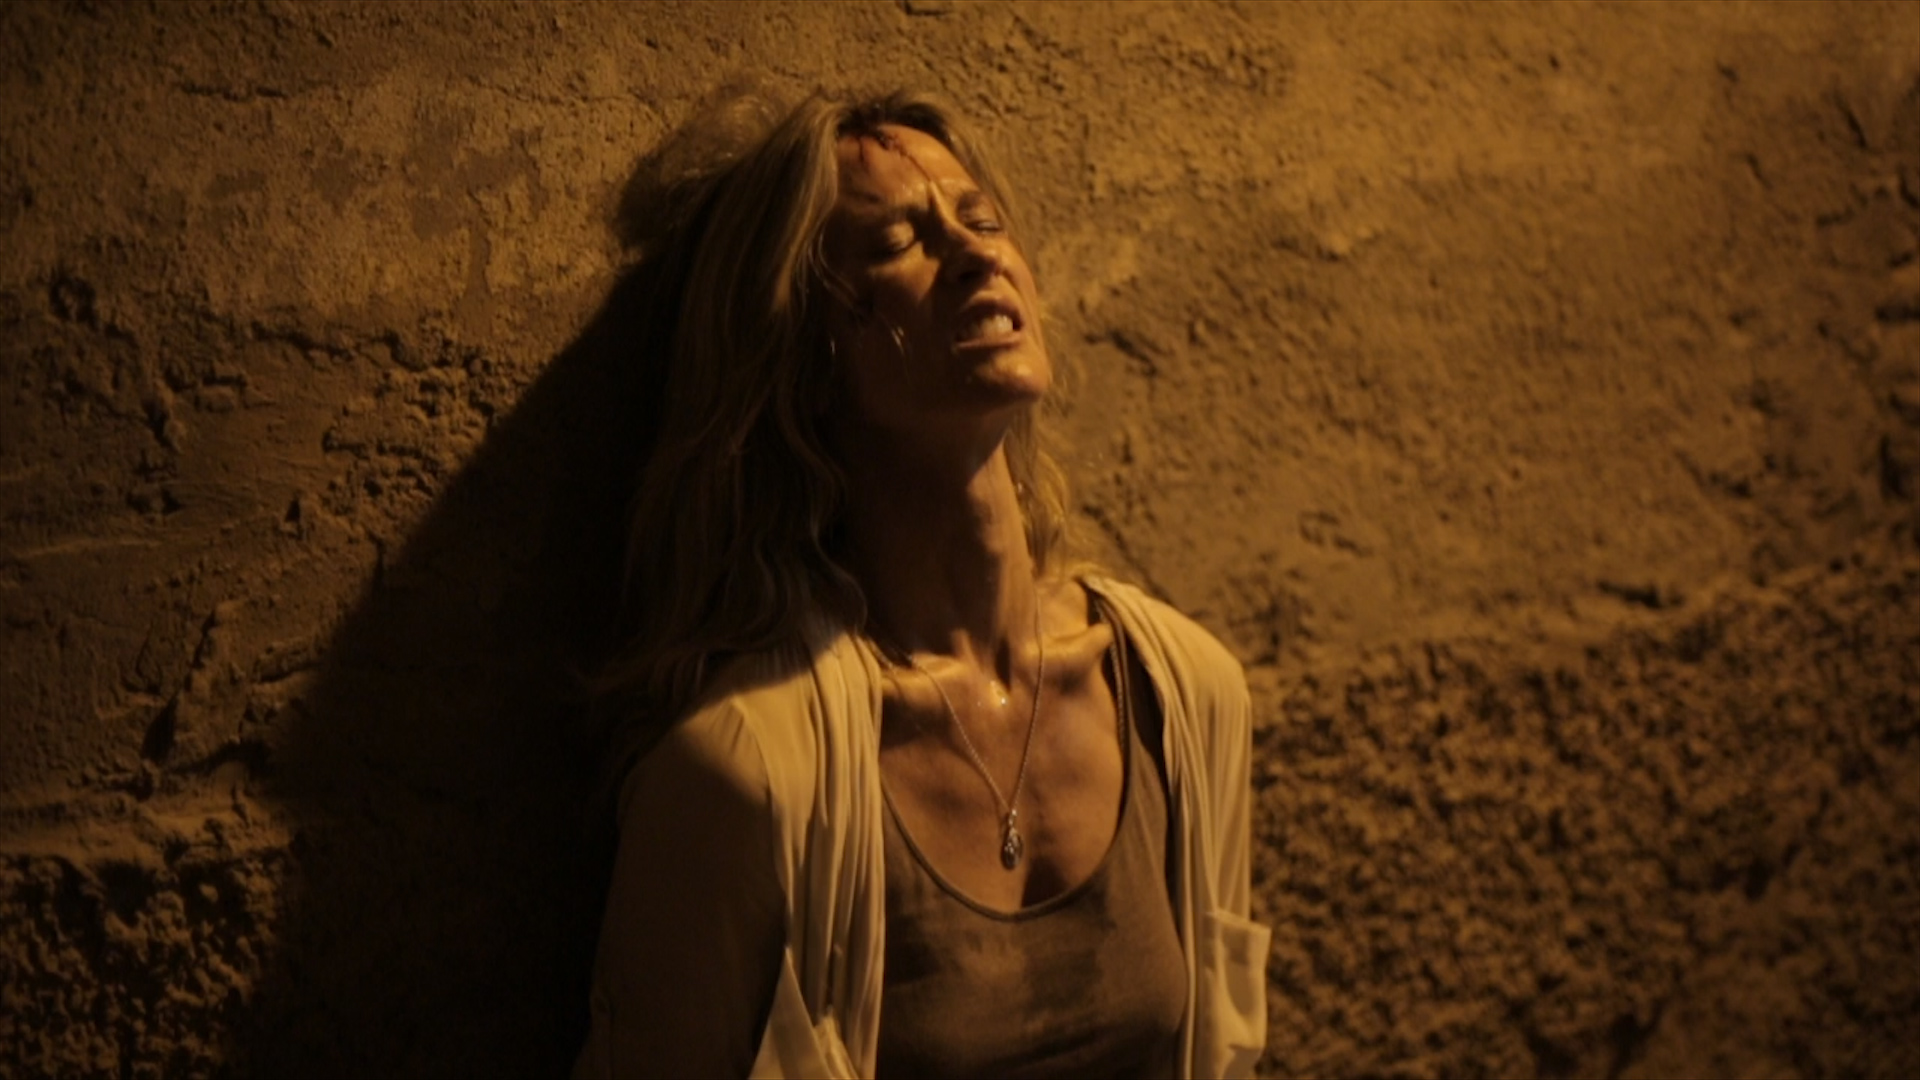 "Phim về bắt cóc trẻ em ""Never Let Go"" tung trailer kịch tính"